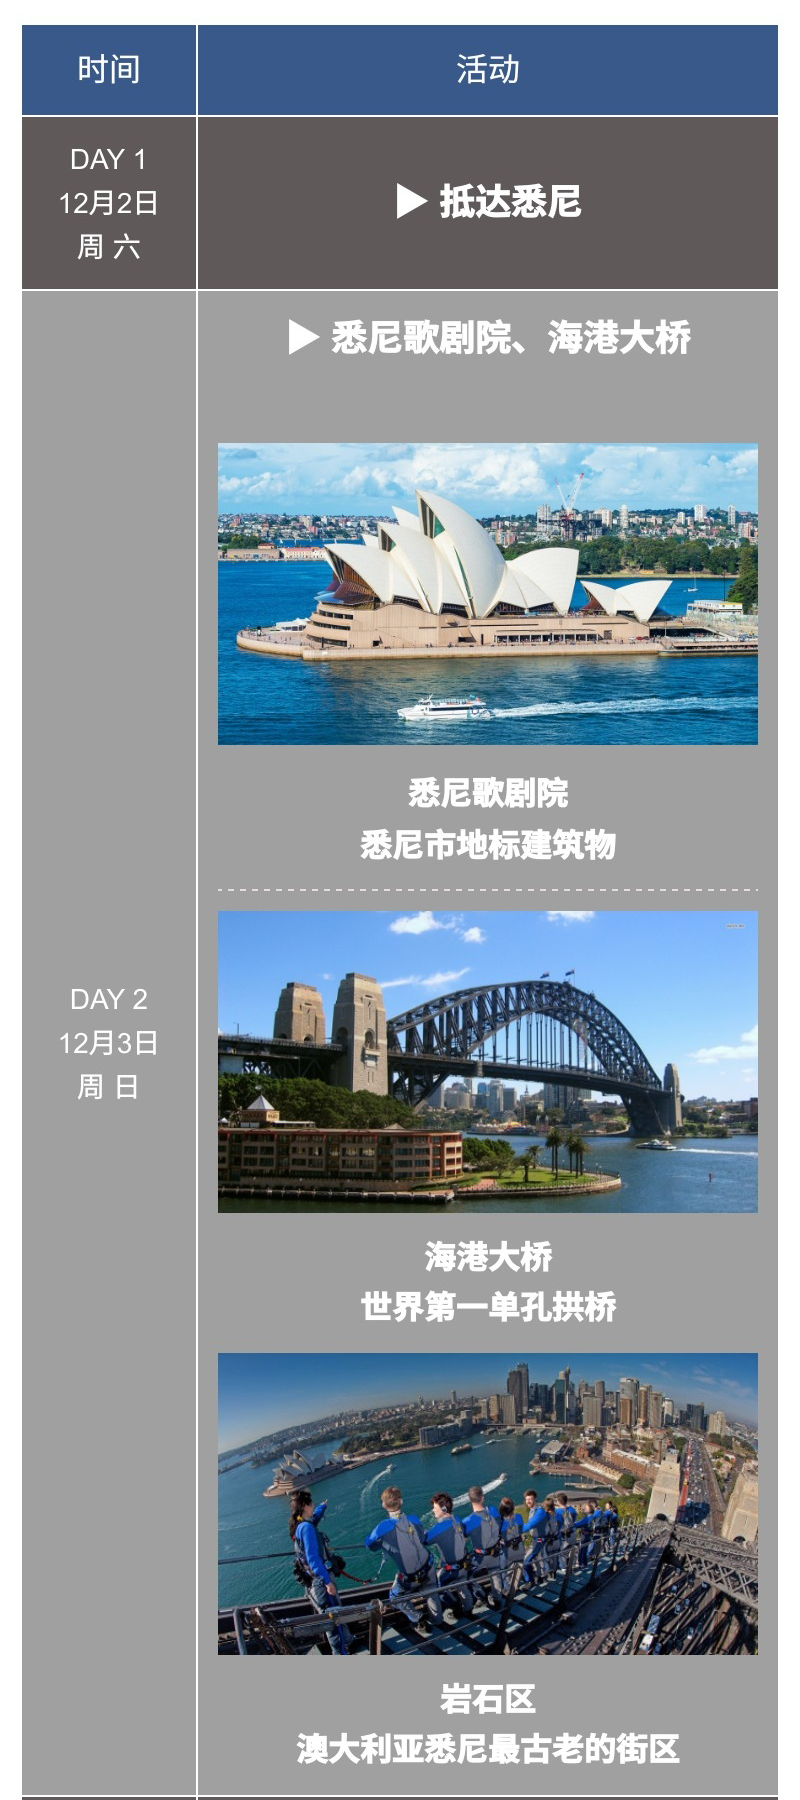 G-Trip澳洲区块链专线之旅